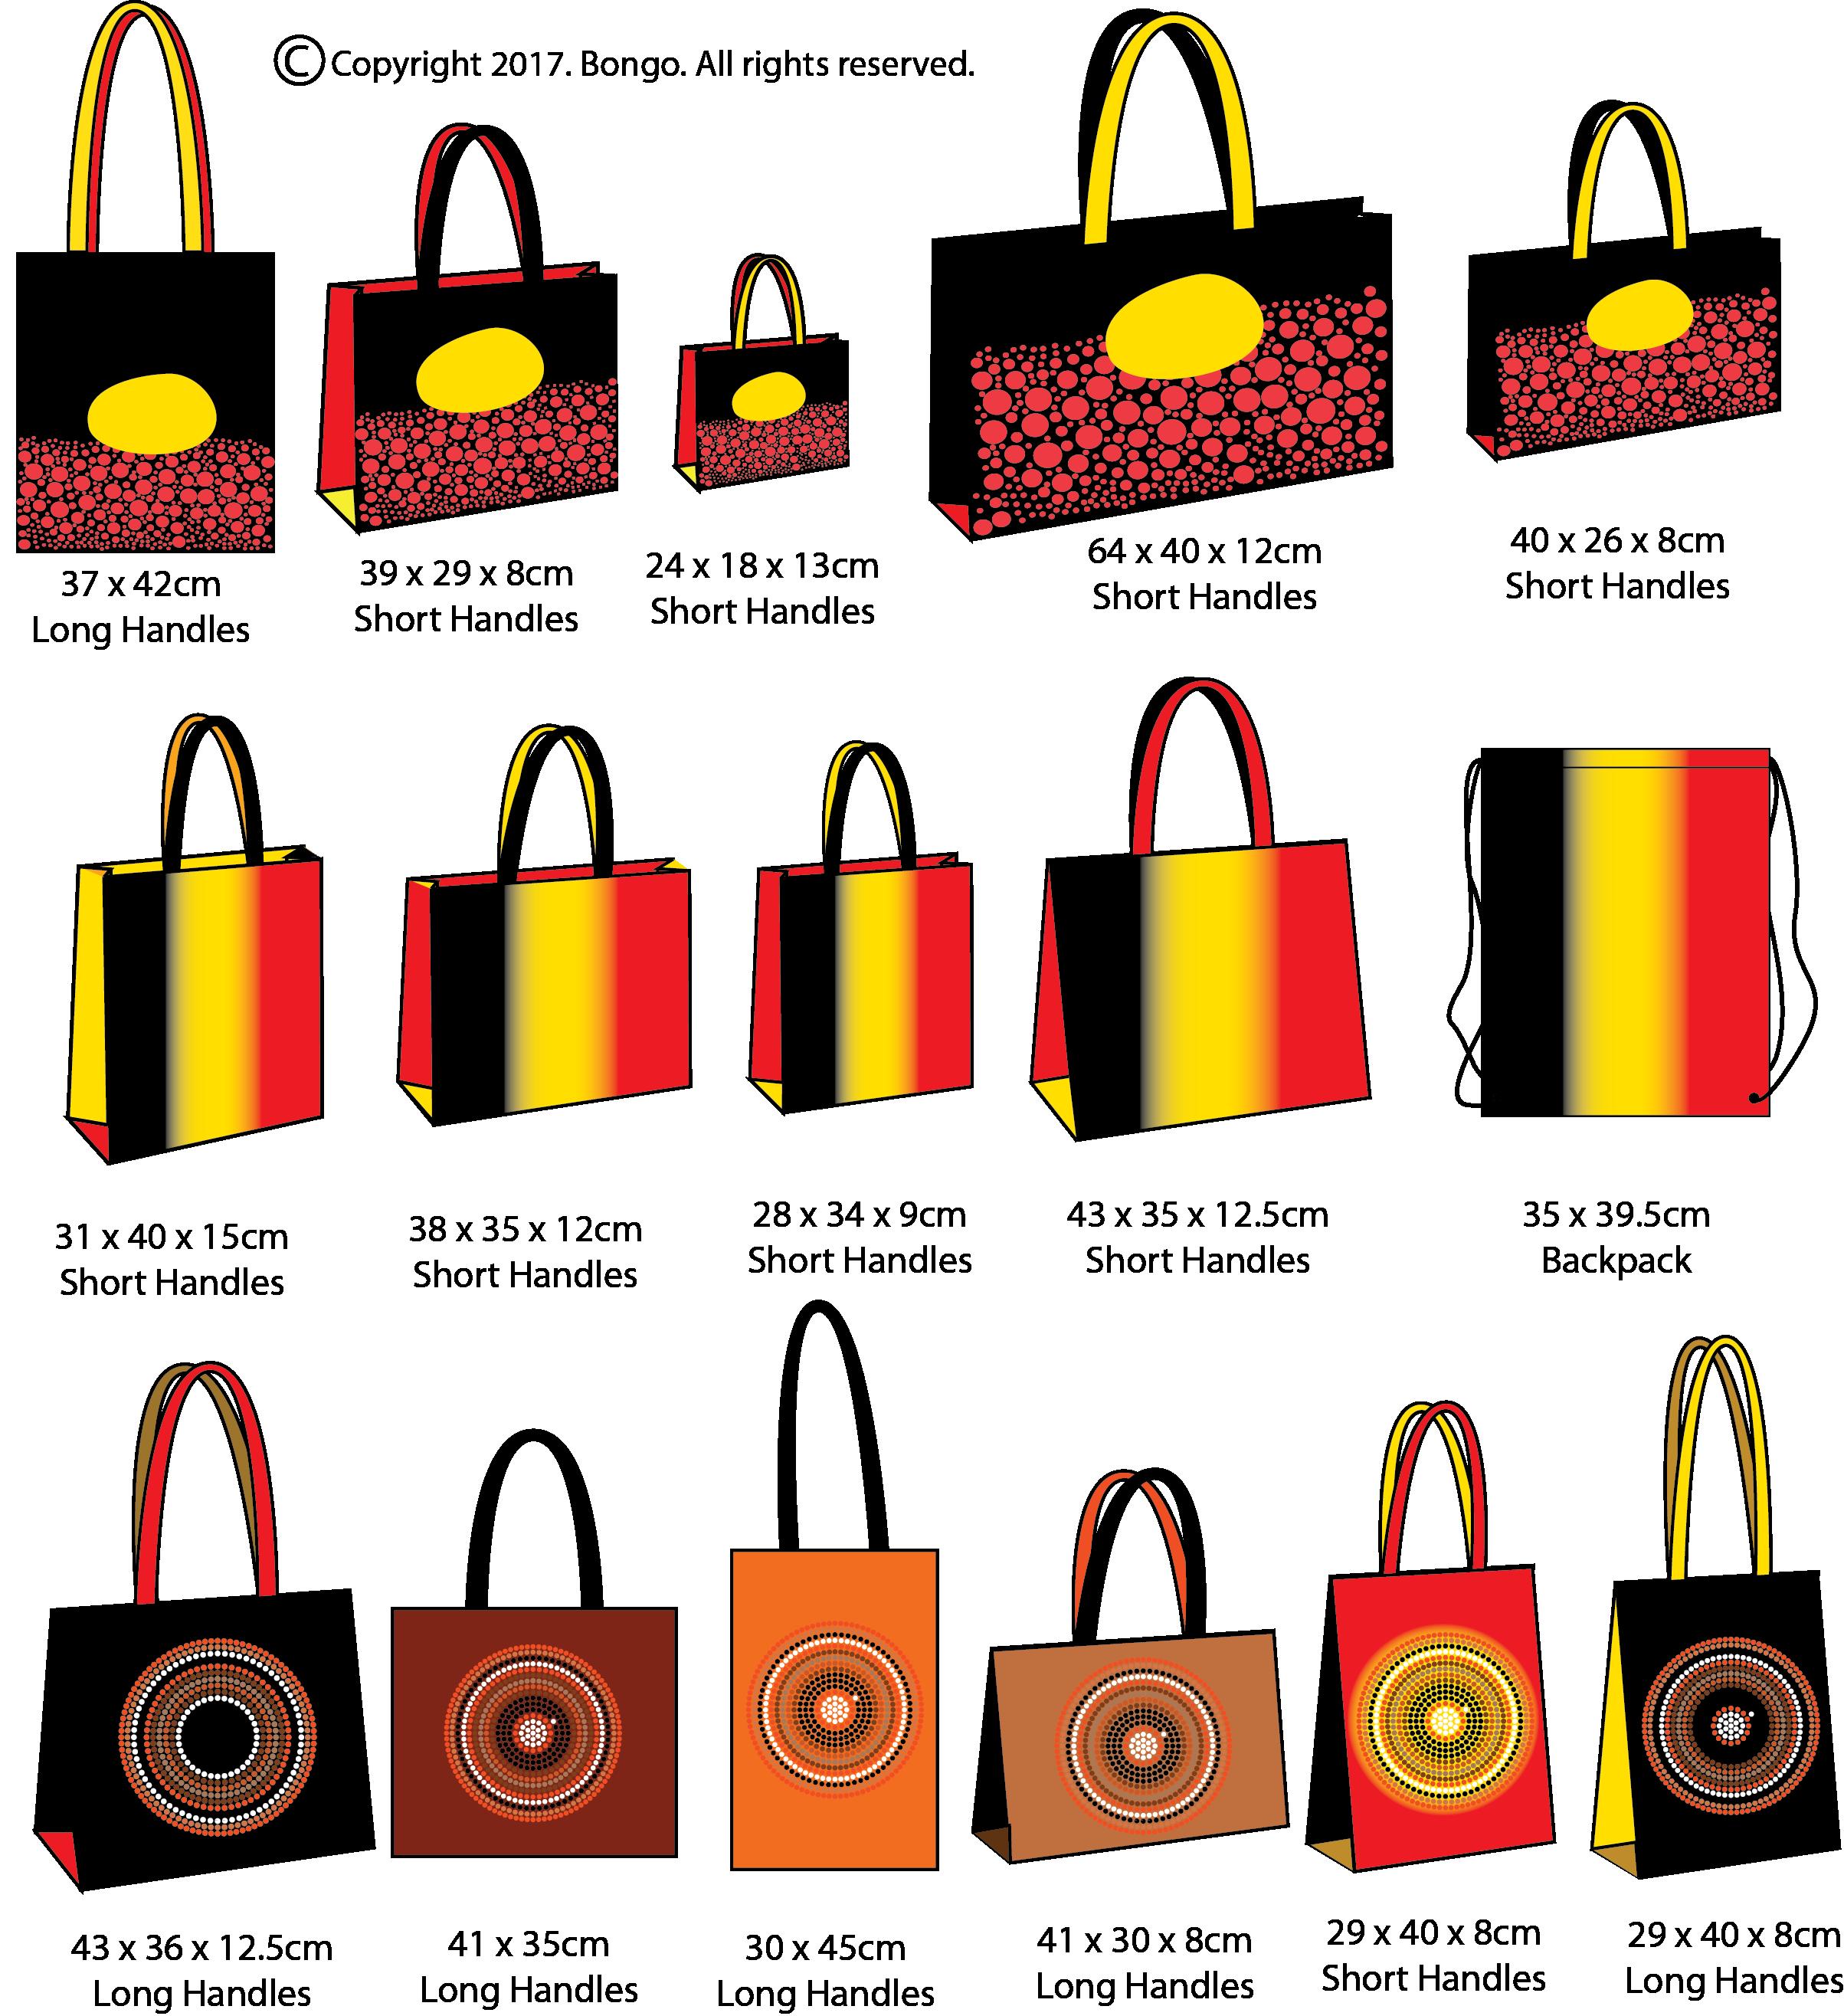 Promotional Aboriginal Theme Tote Bags Bongo